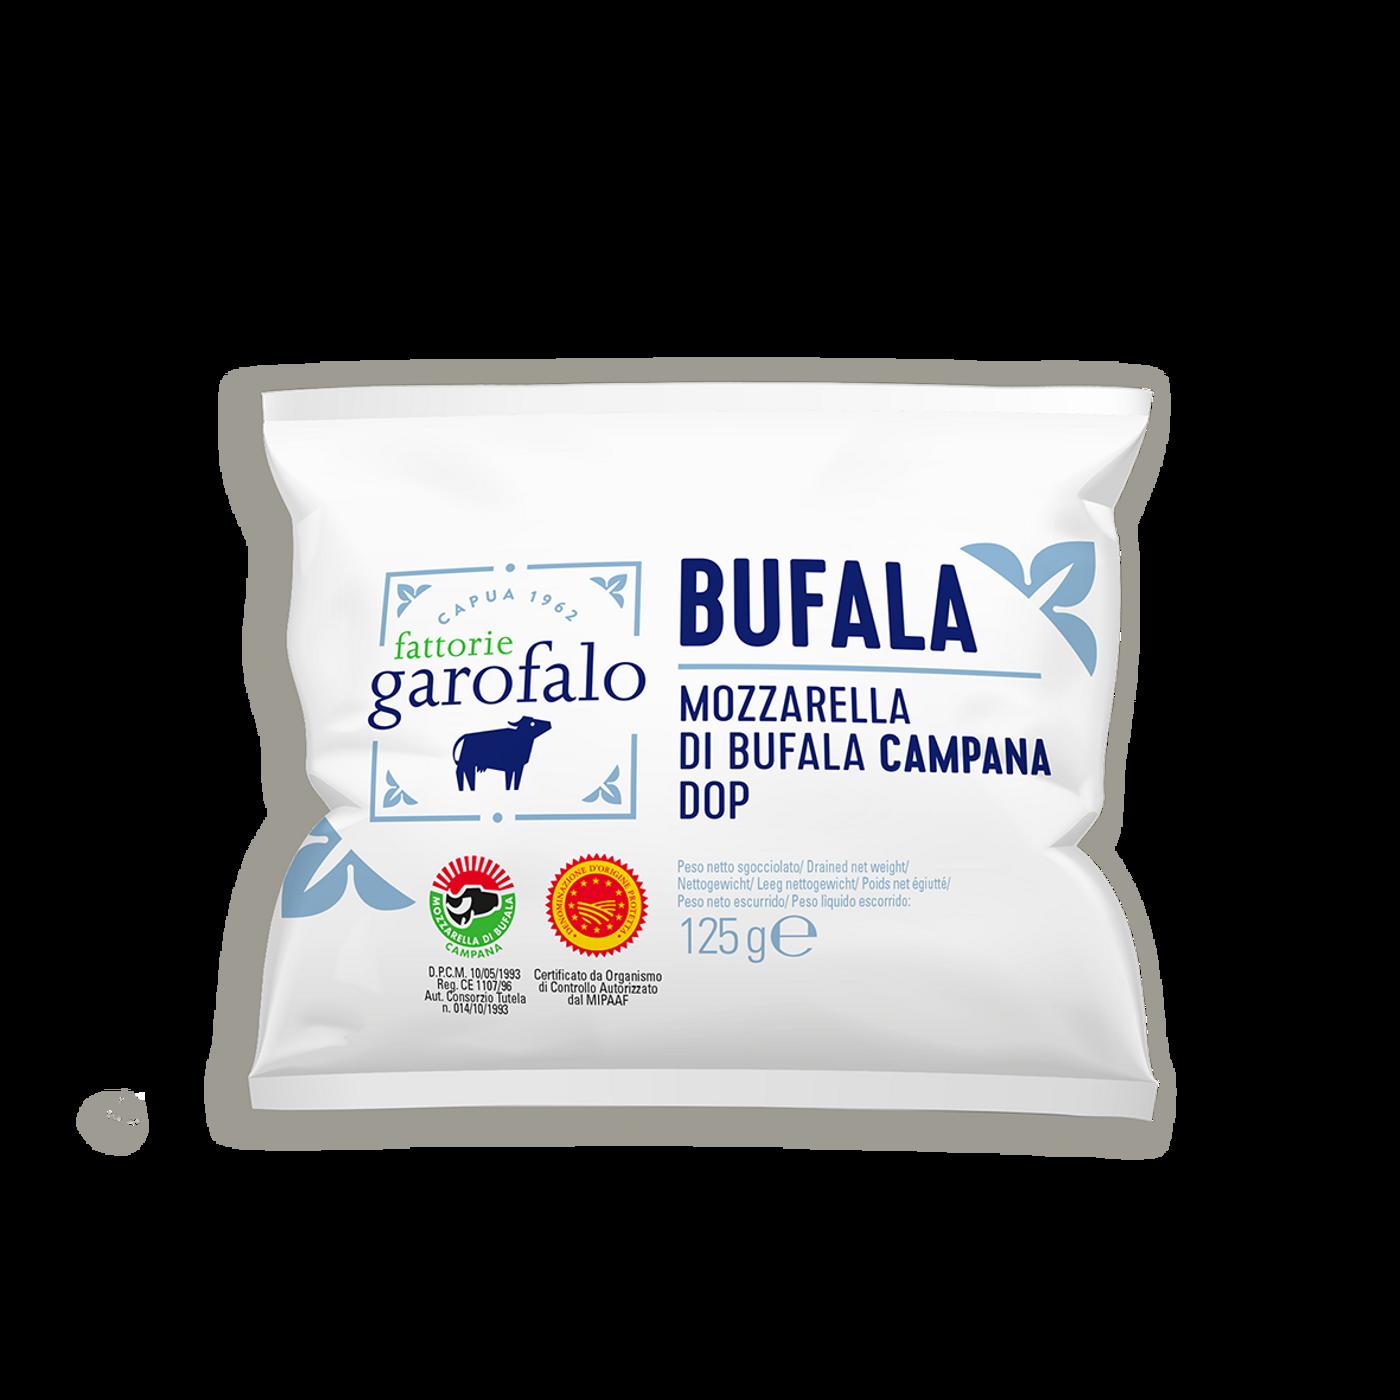 Mozzarella De Búfala Campana Dop